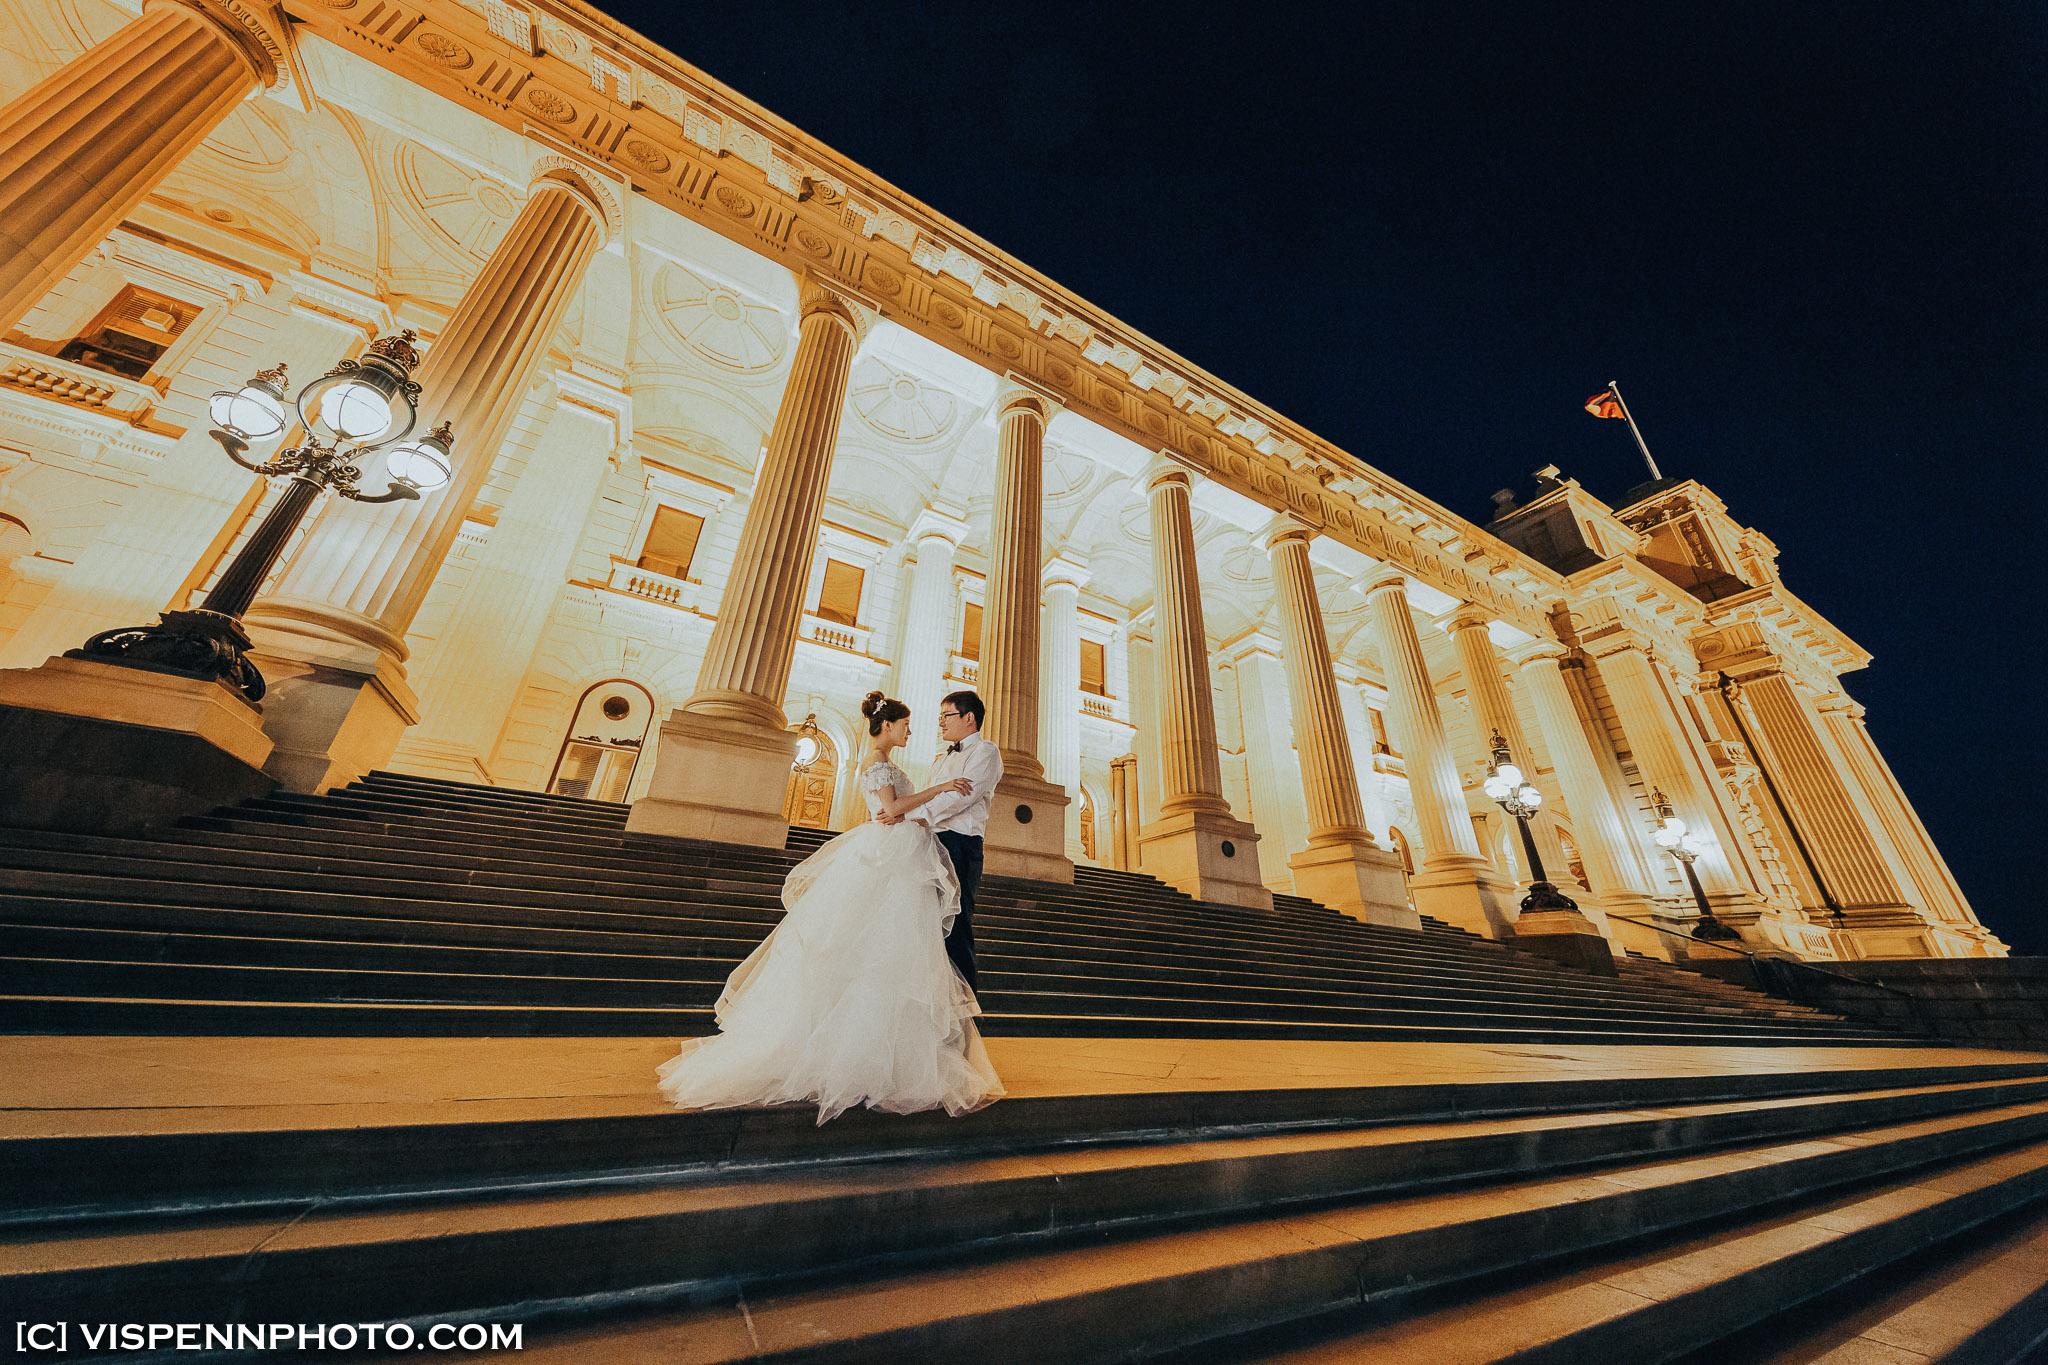 PRE WEDDING Photography Melbourne VISPENN 墨尔本 婚纱照 结婚照 婚纱摄影 VISPENN Olivia 3370